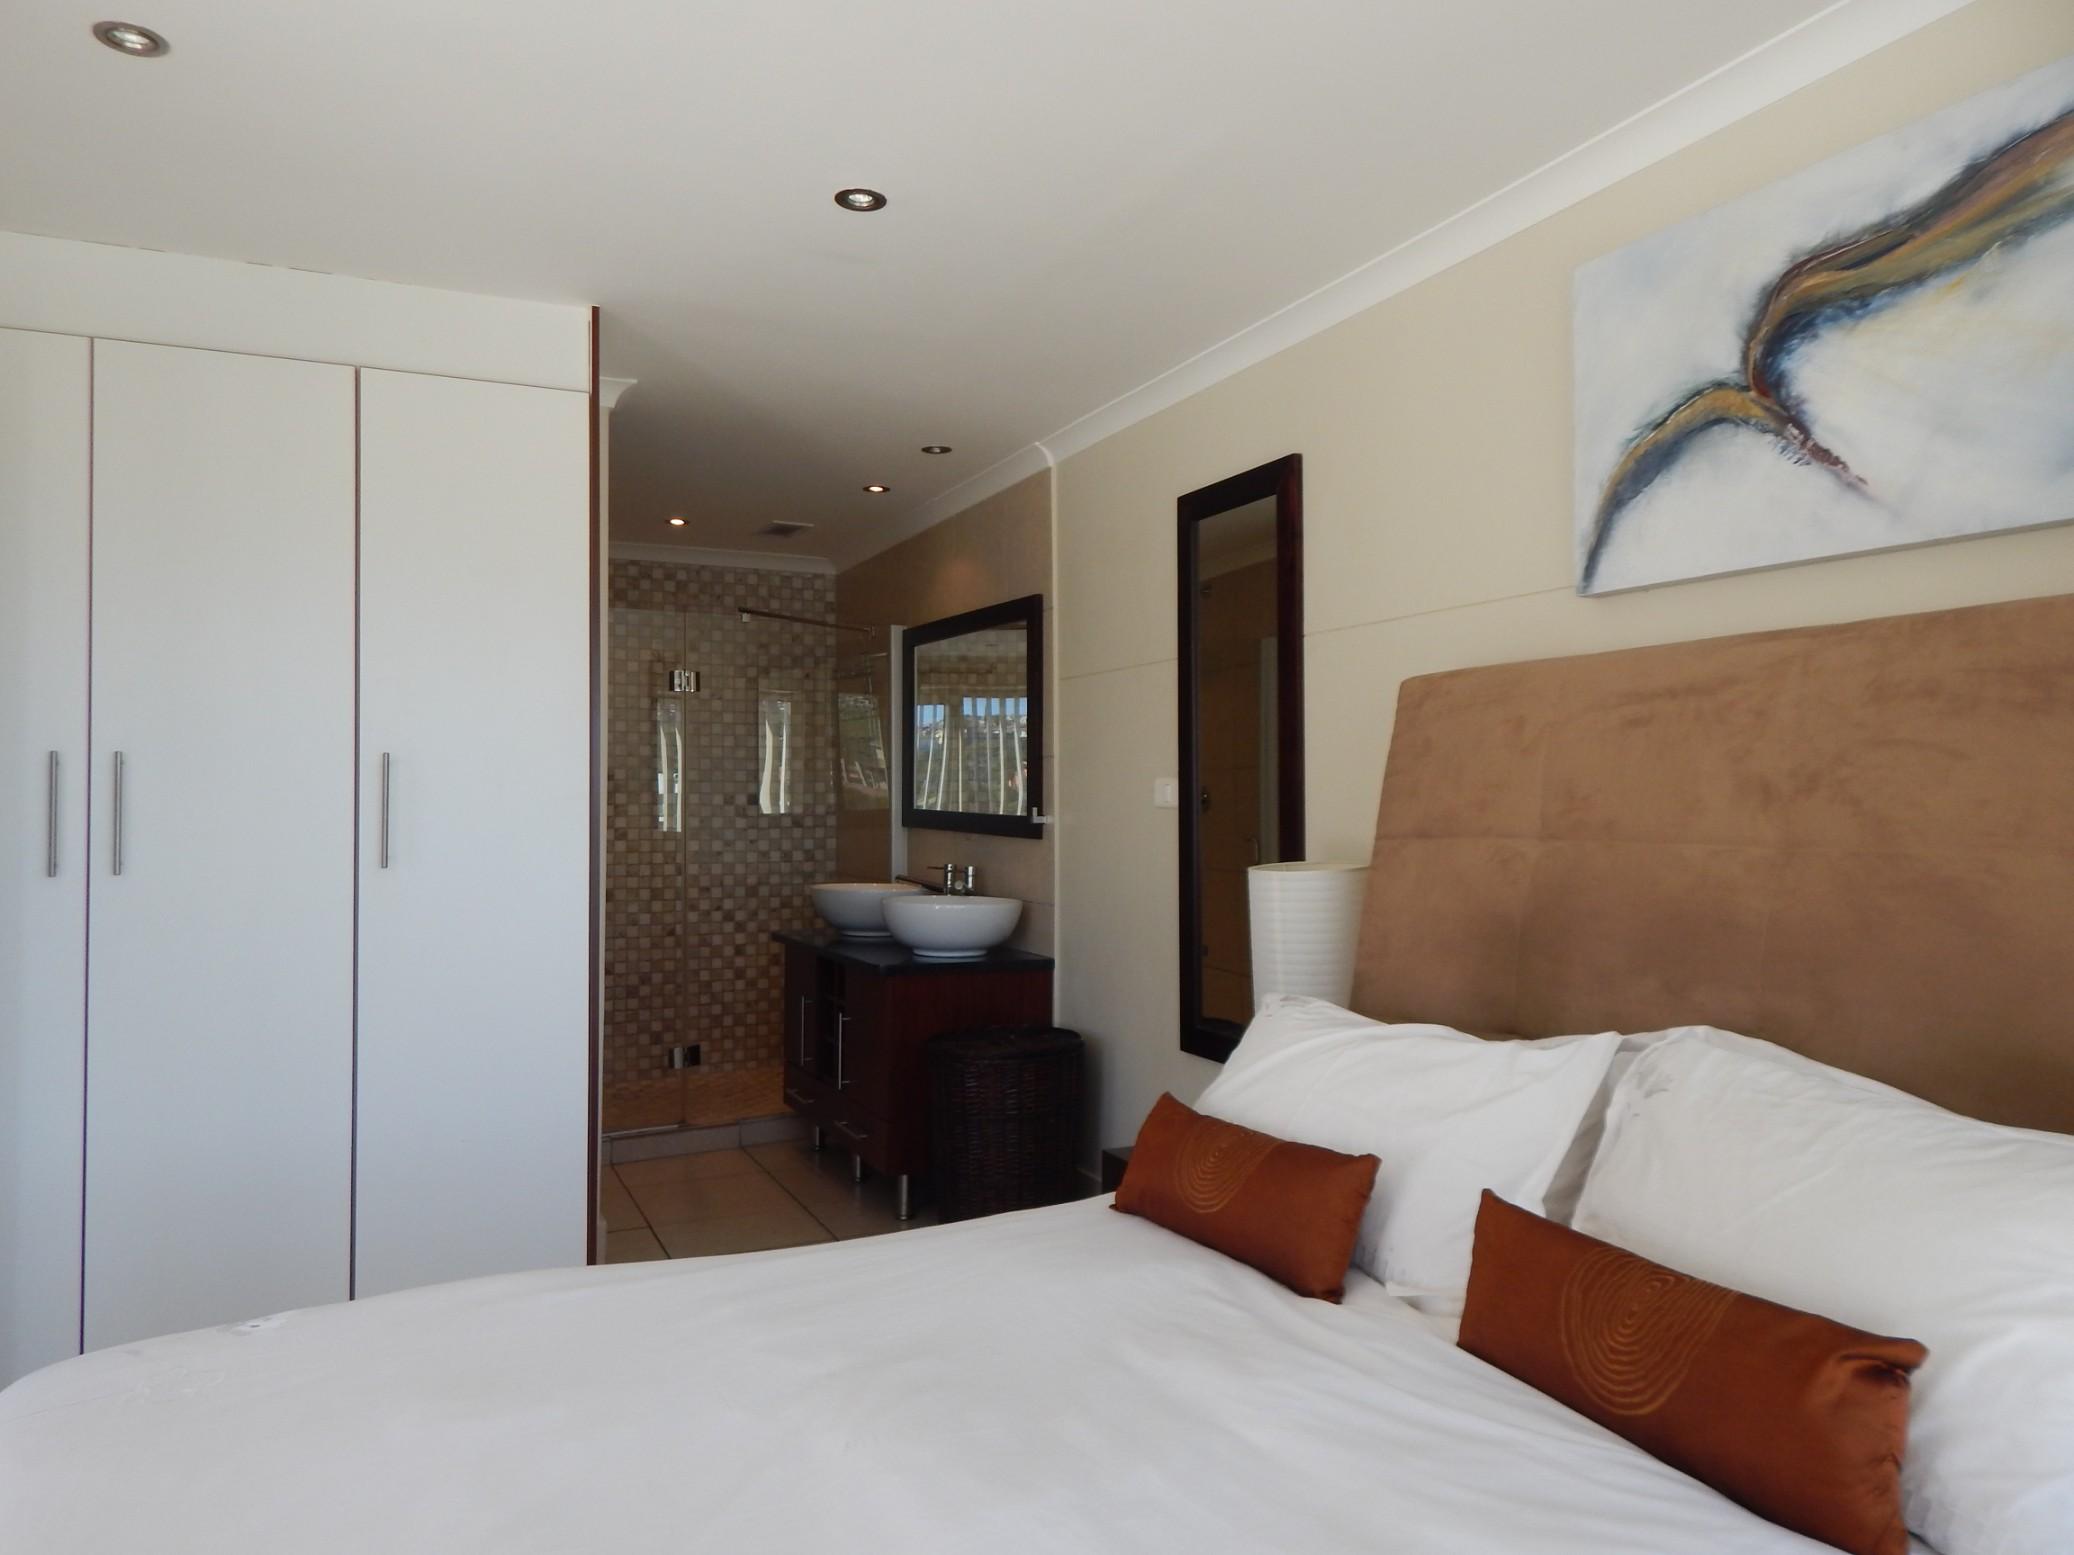 2 Bedroom Apartment for sale in De Bakke ENT0067862 : photo#7